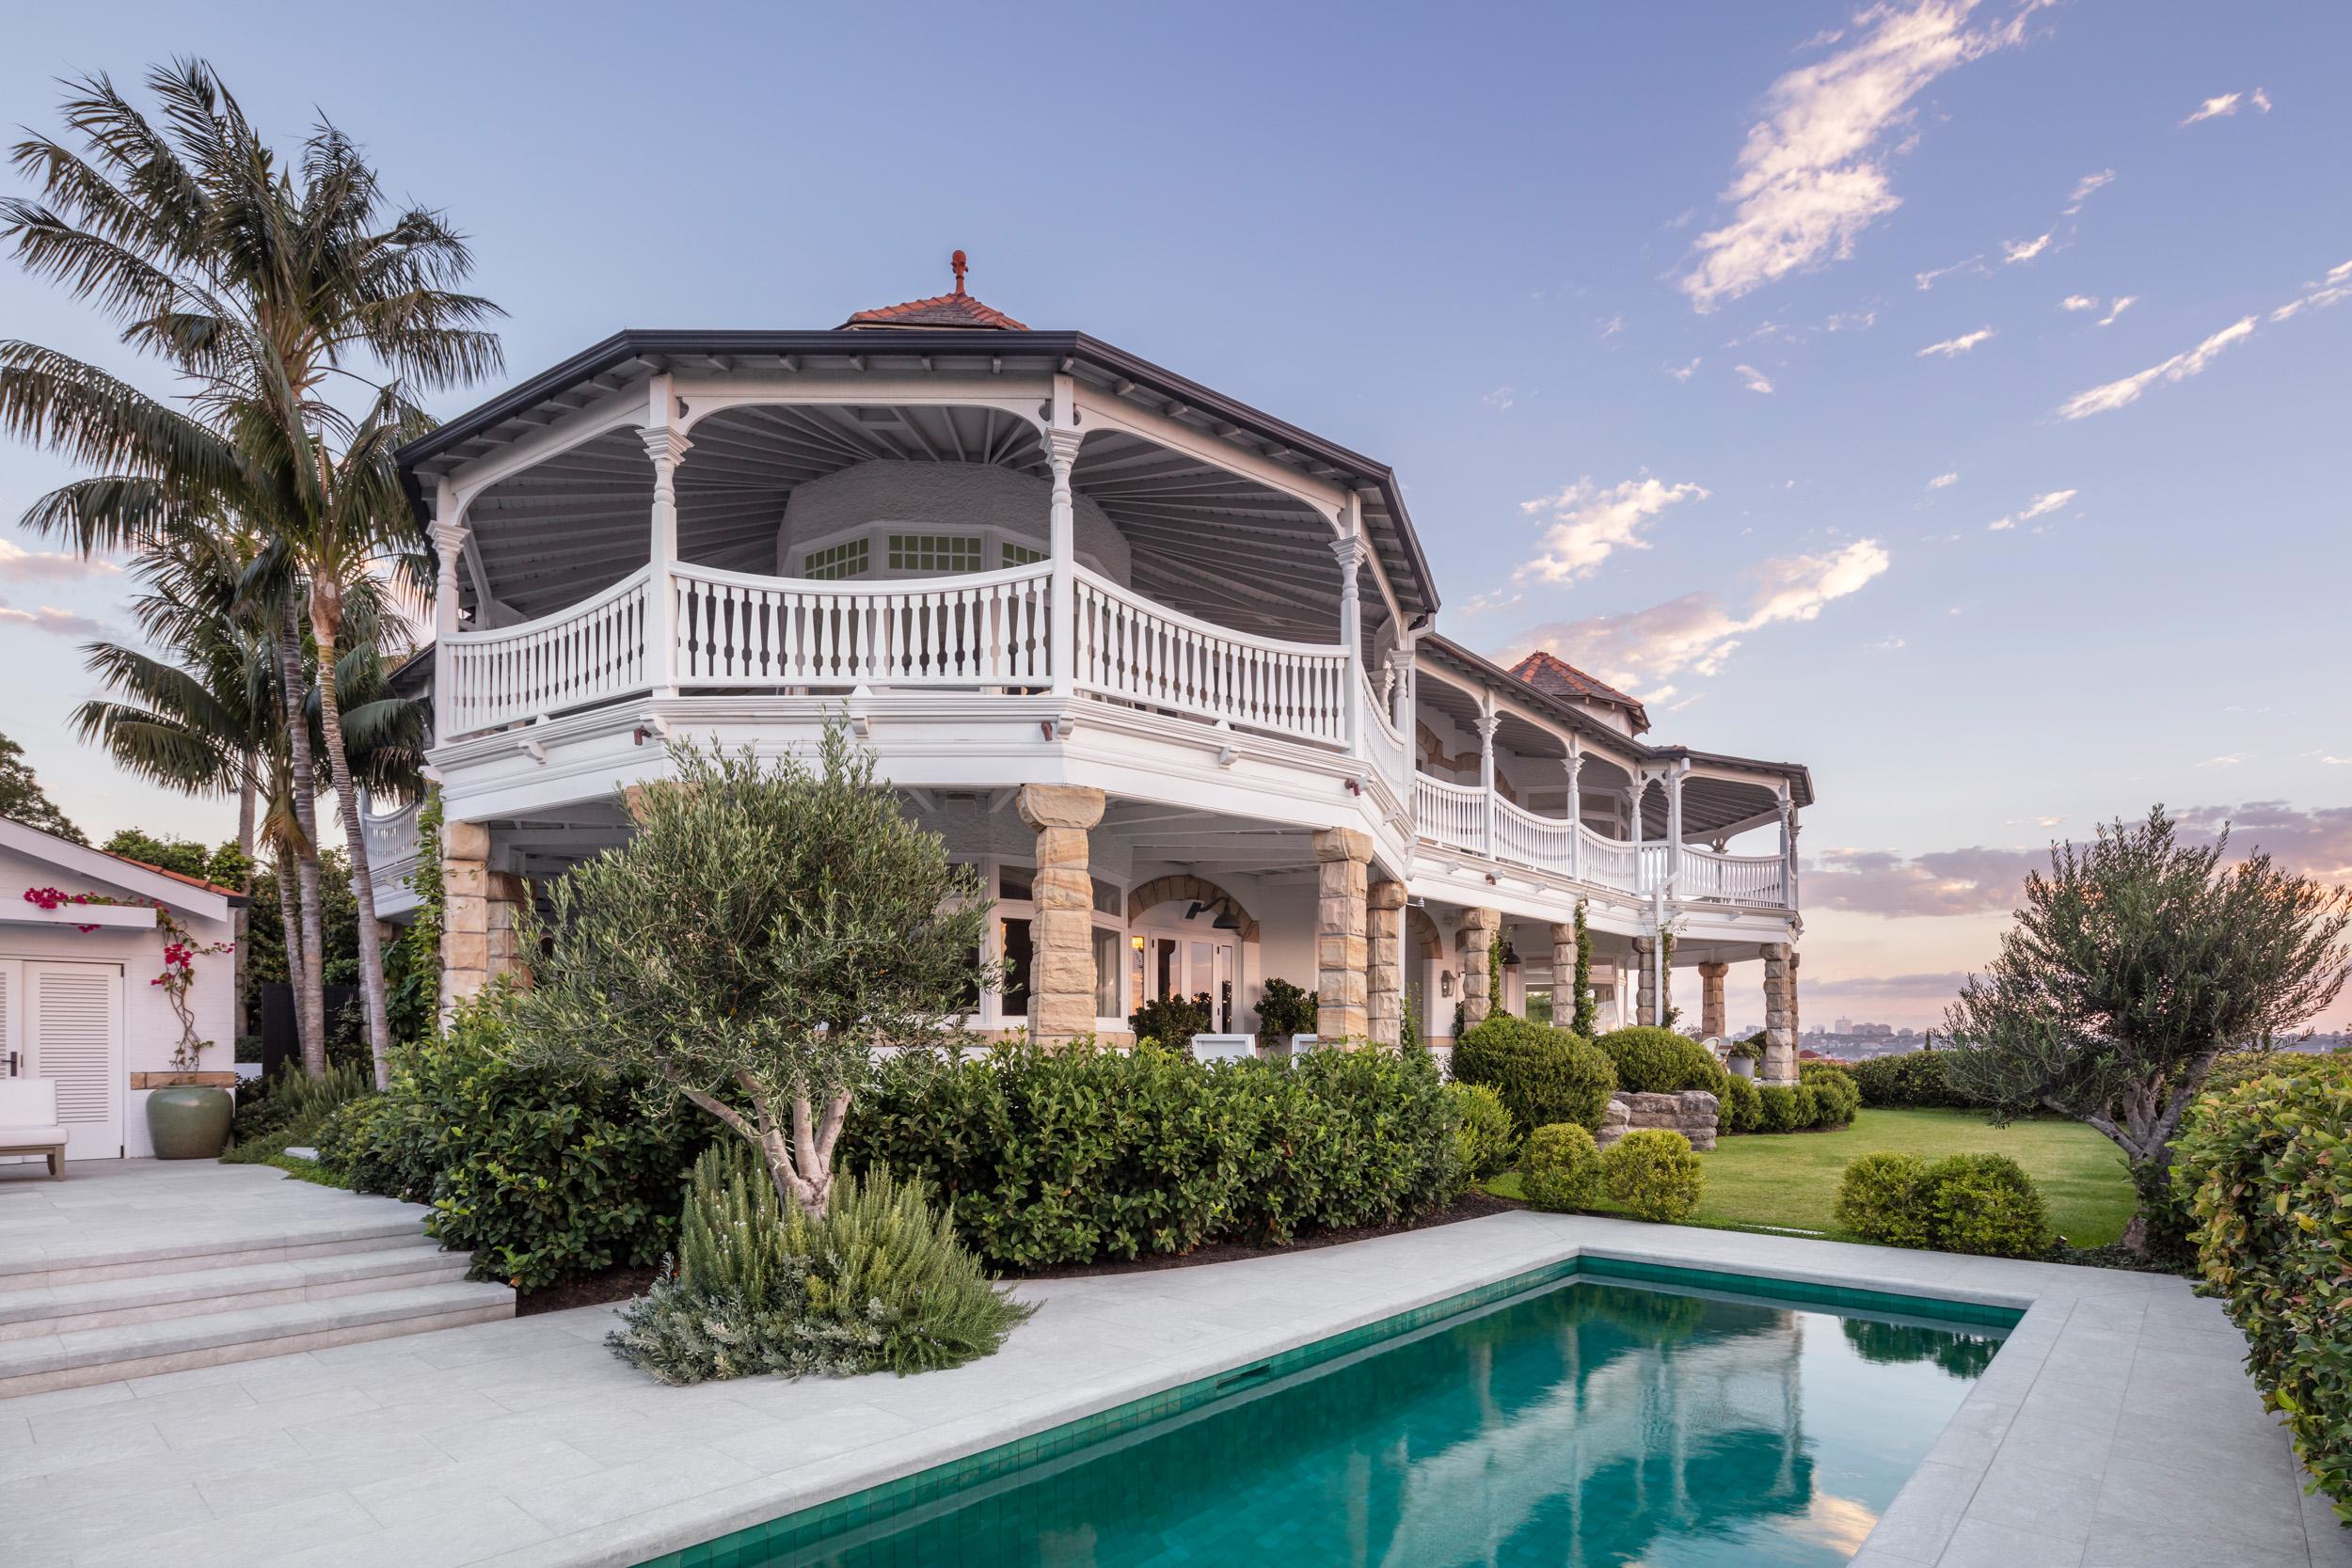 Jem_Cresswell_Architecture_Residential_Photographer_Sydney_Australia_007.jpg